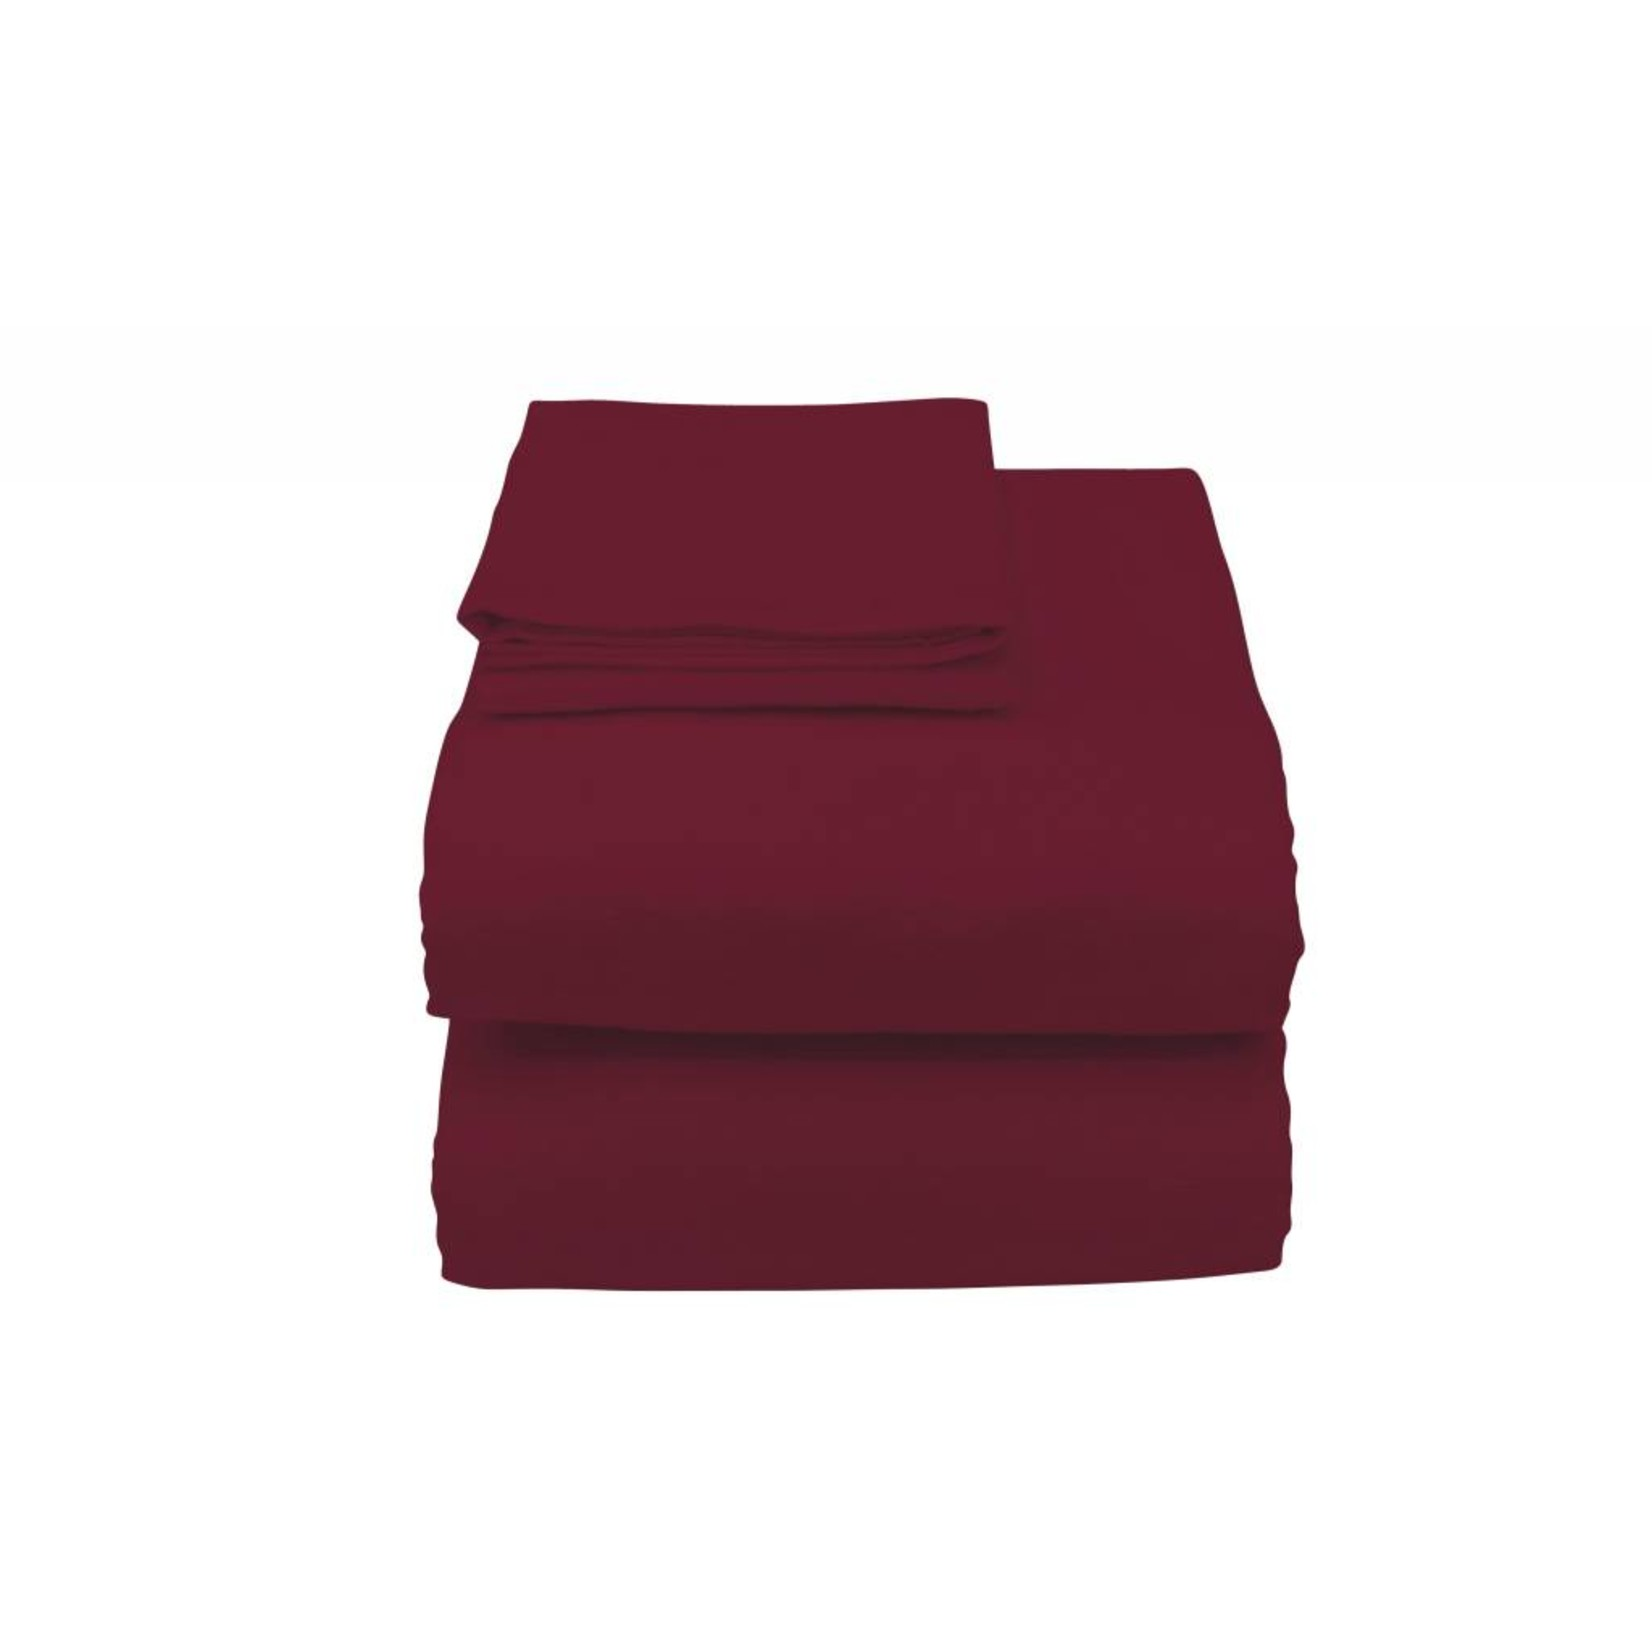 Essential Medical Sheets SET -Cotton Burgundy (5) (DISC)